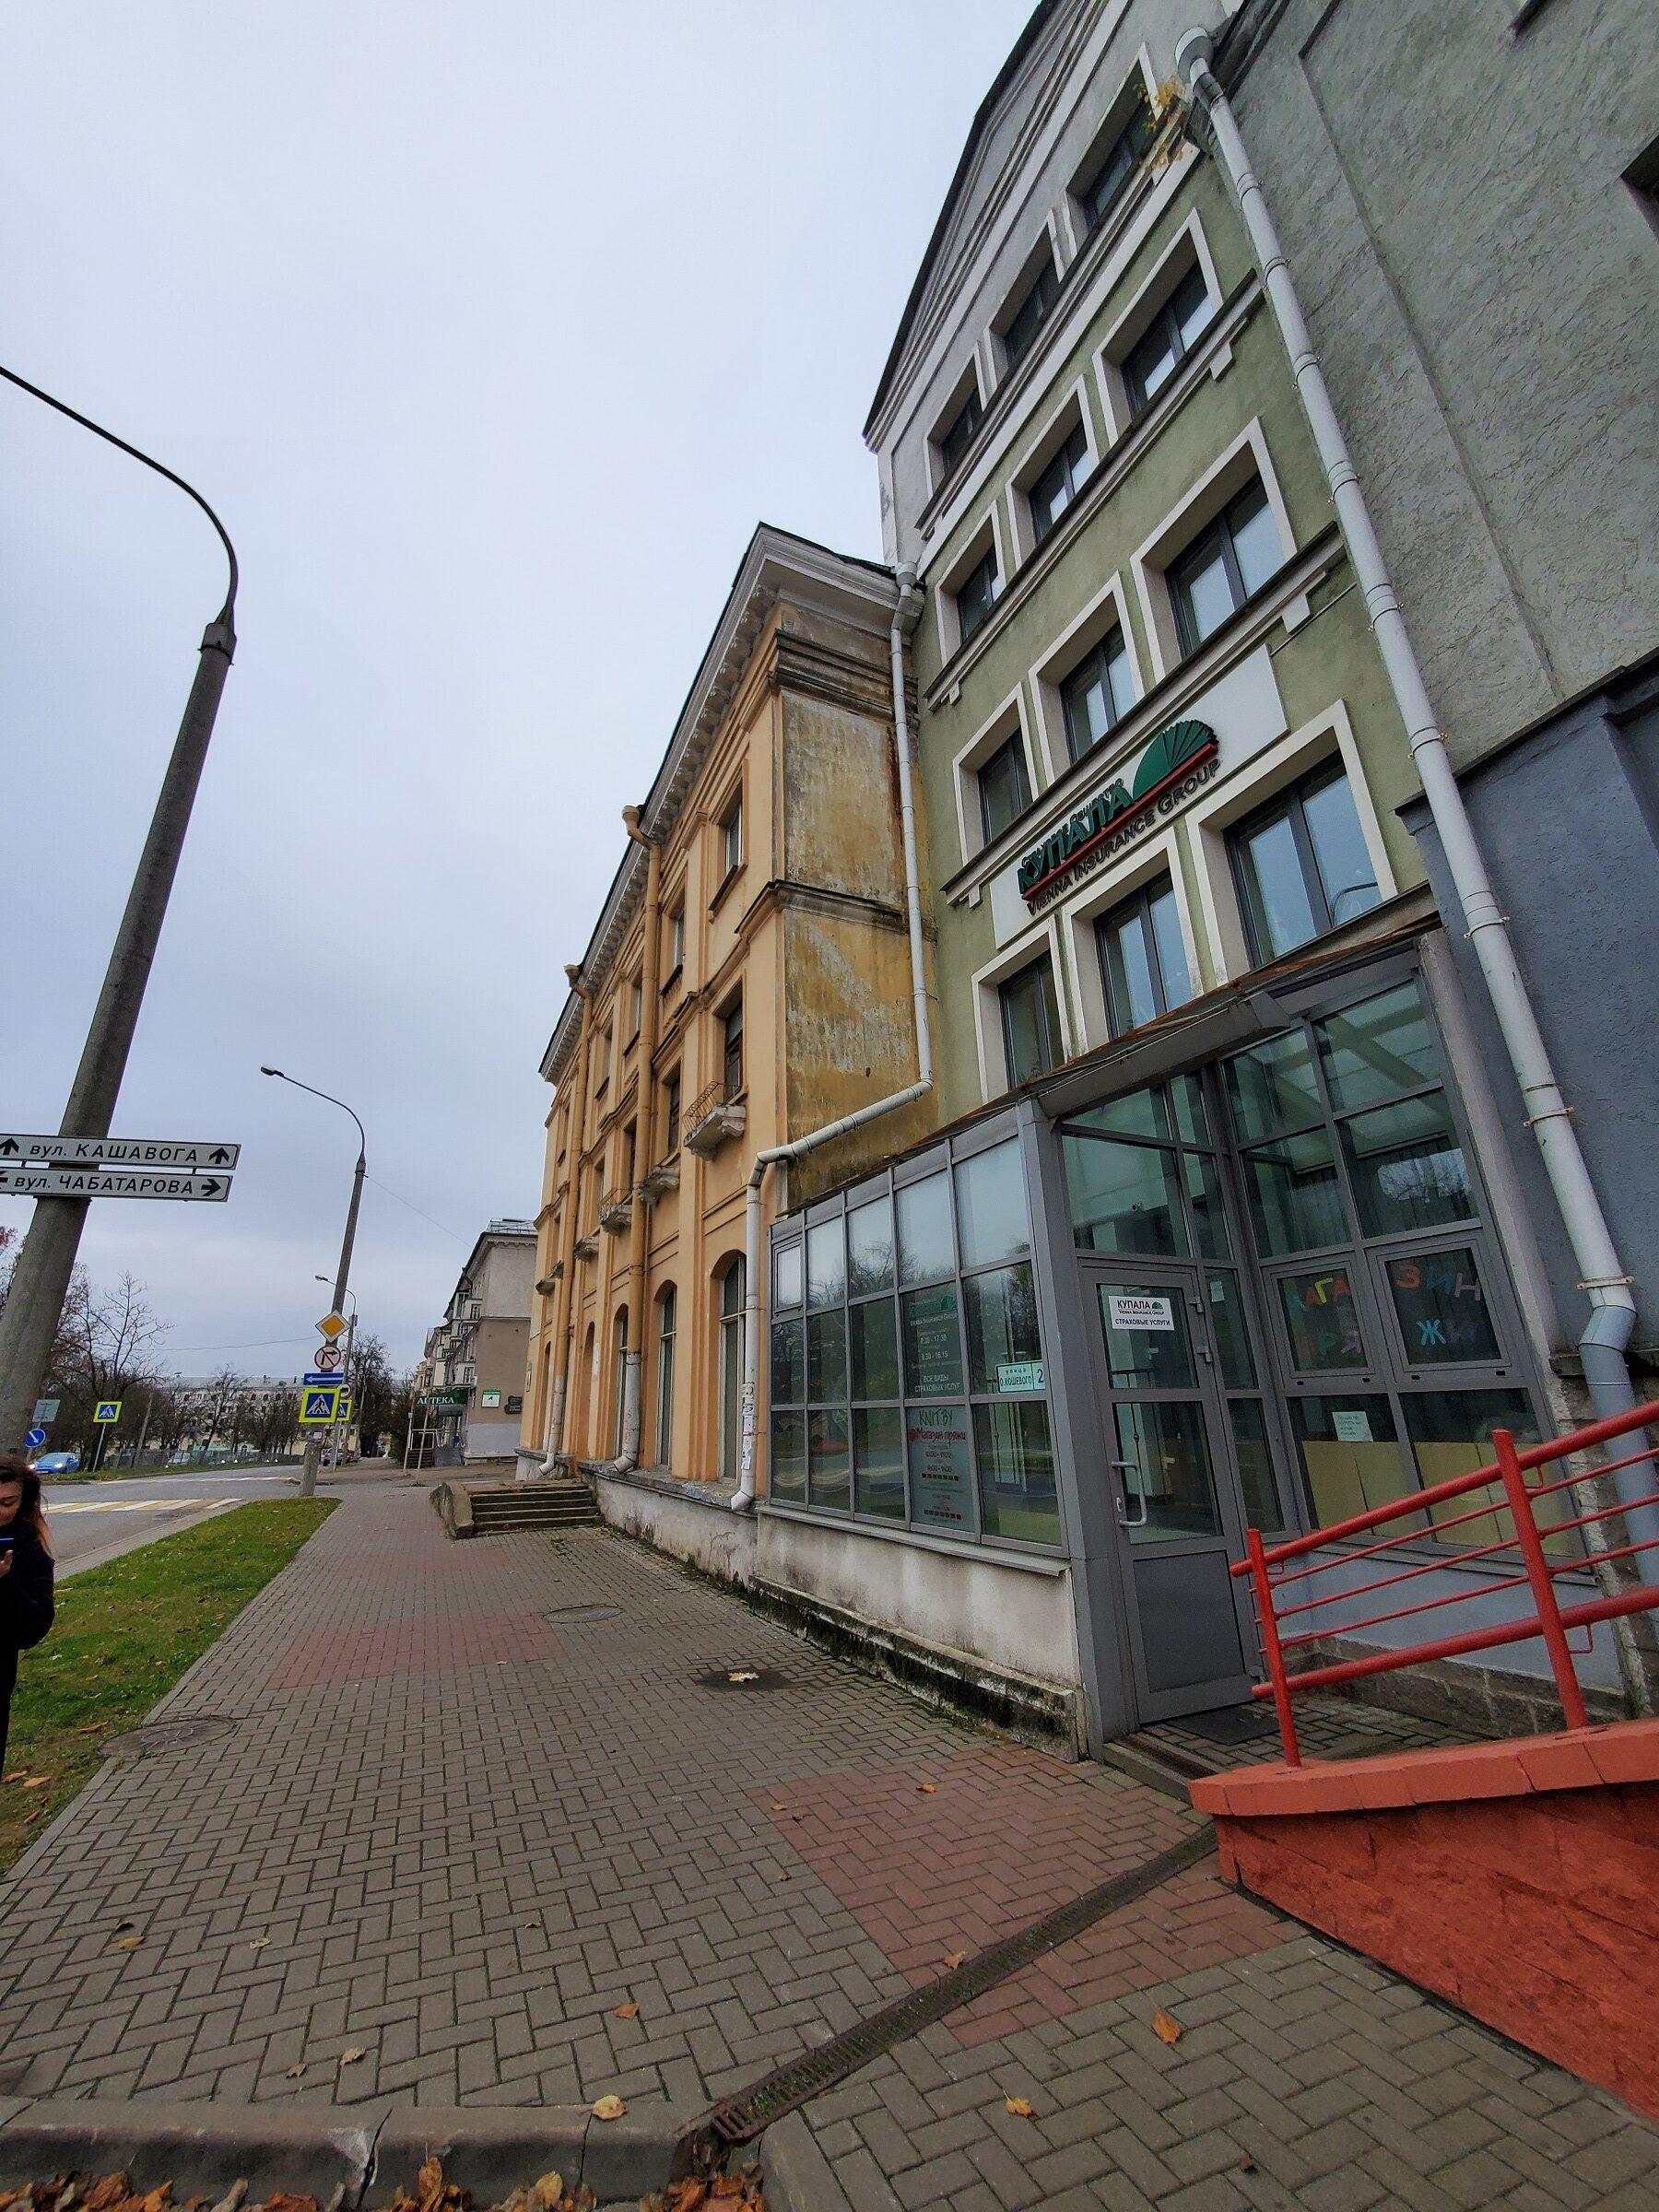 20201107 150600 rotated - Минск. Тракторозаводской поселок